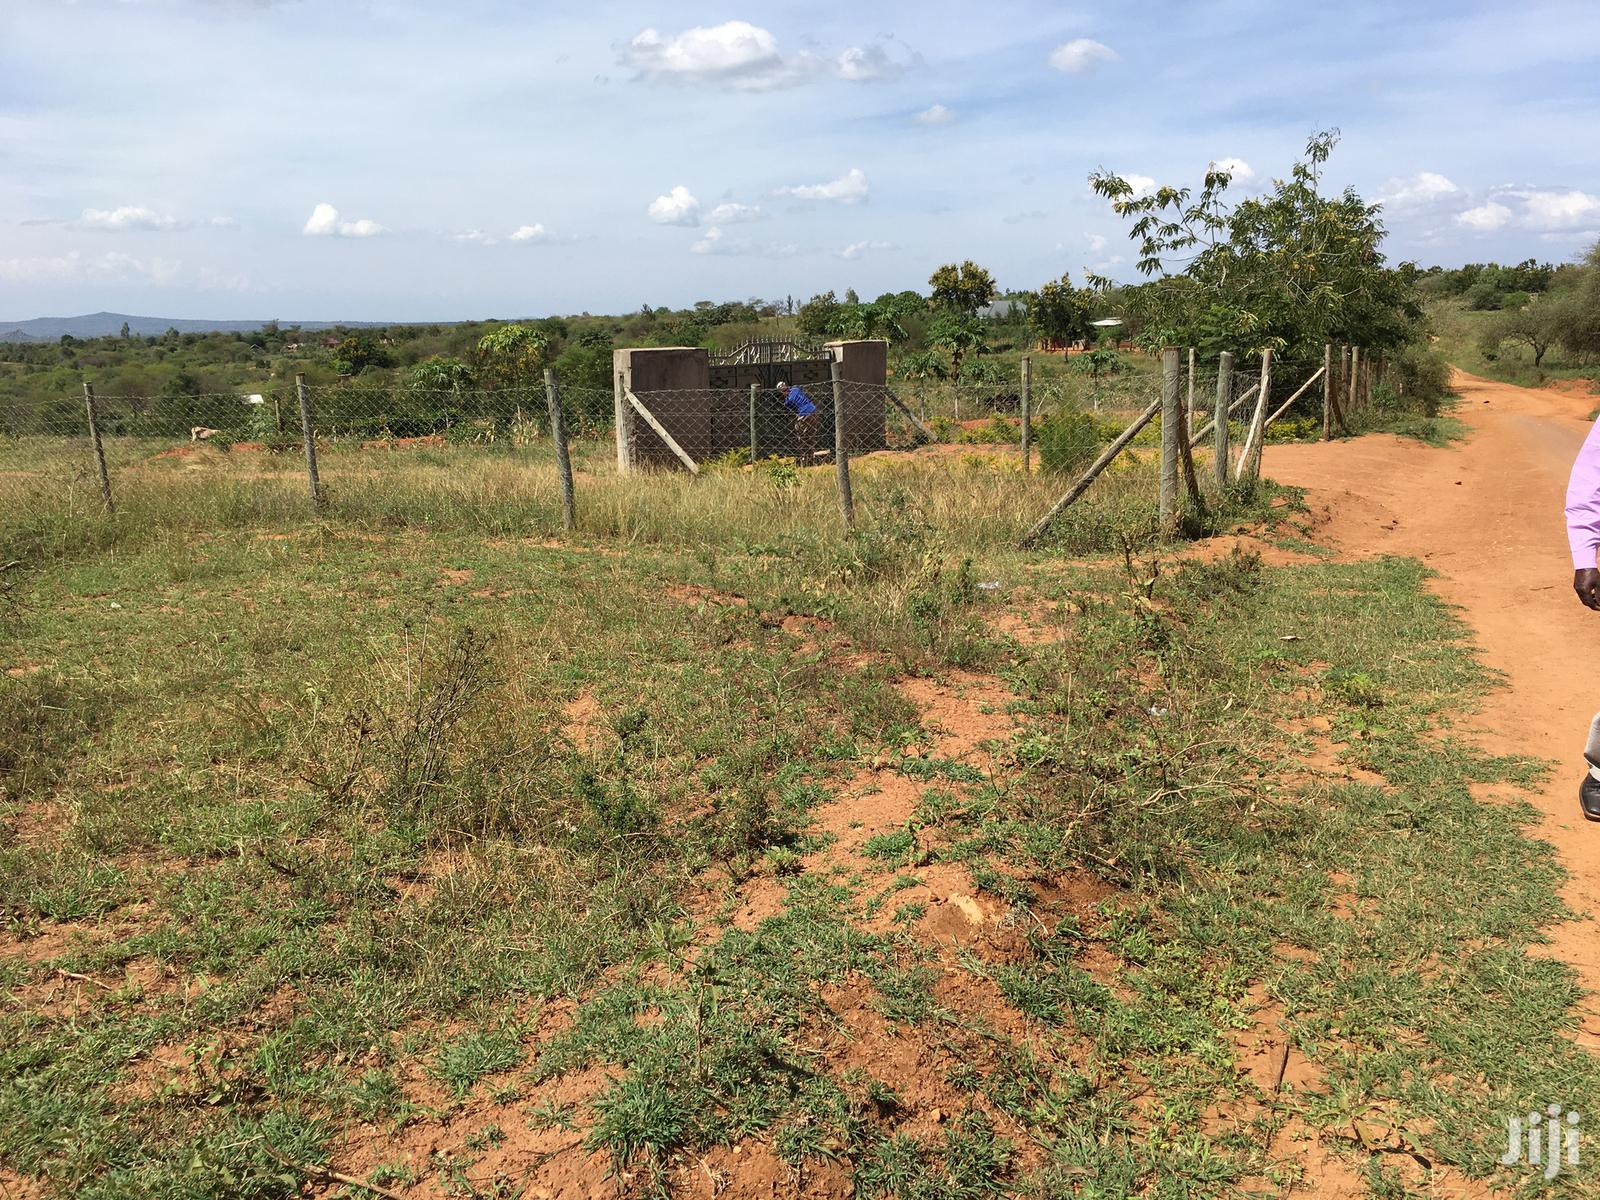 Two Acres for Sale in Kithimani-Sophia Matuu